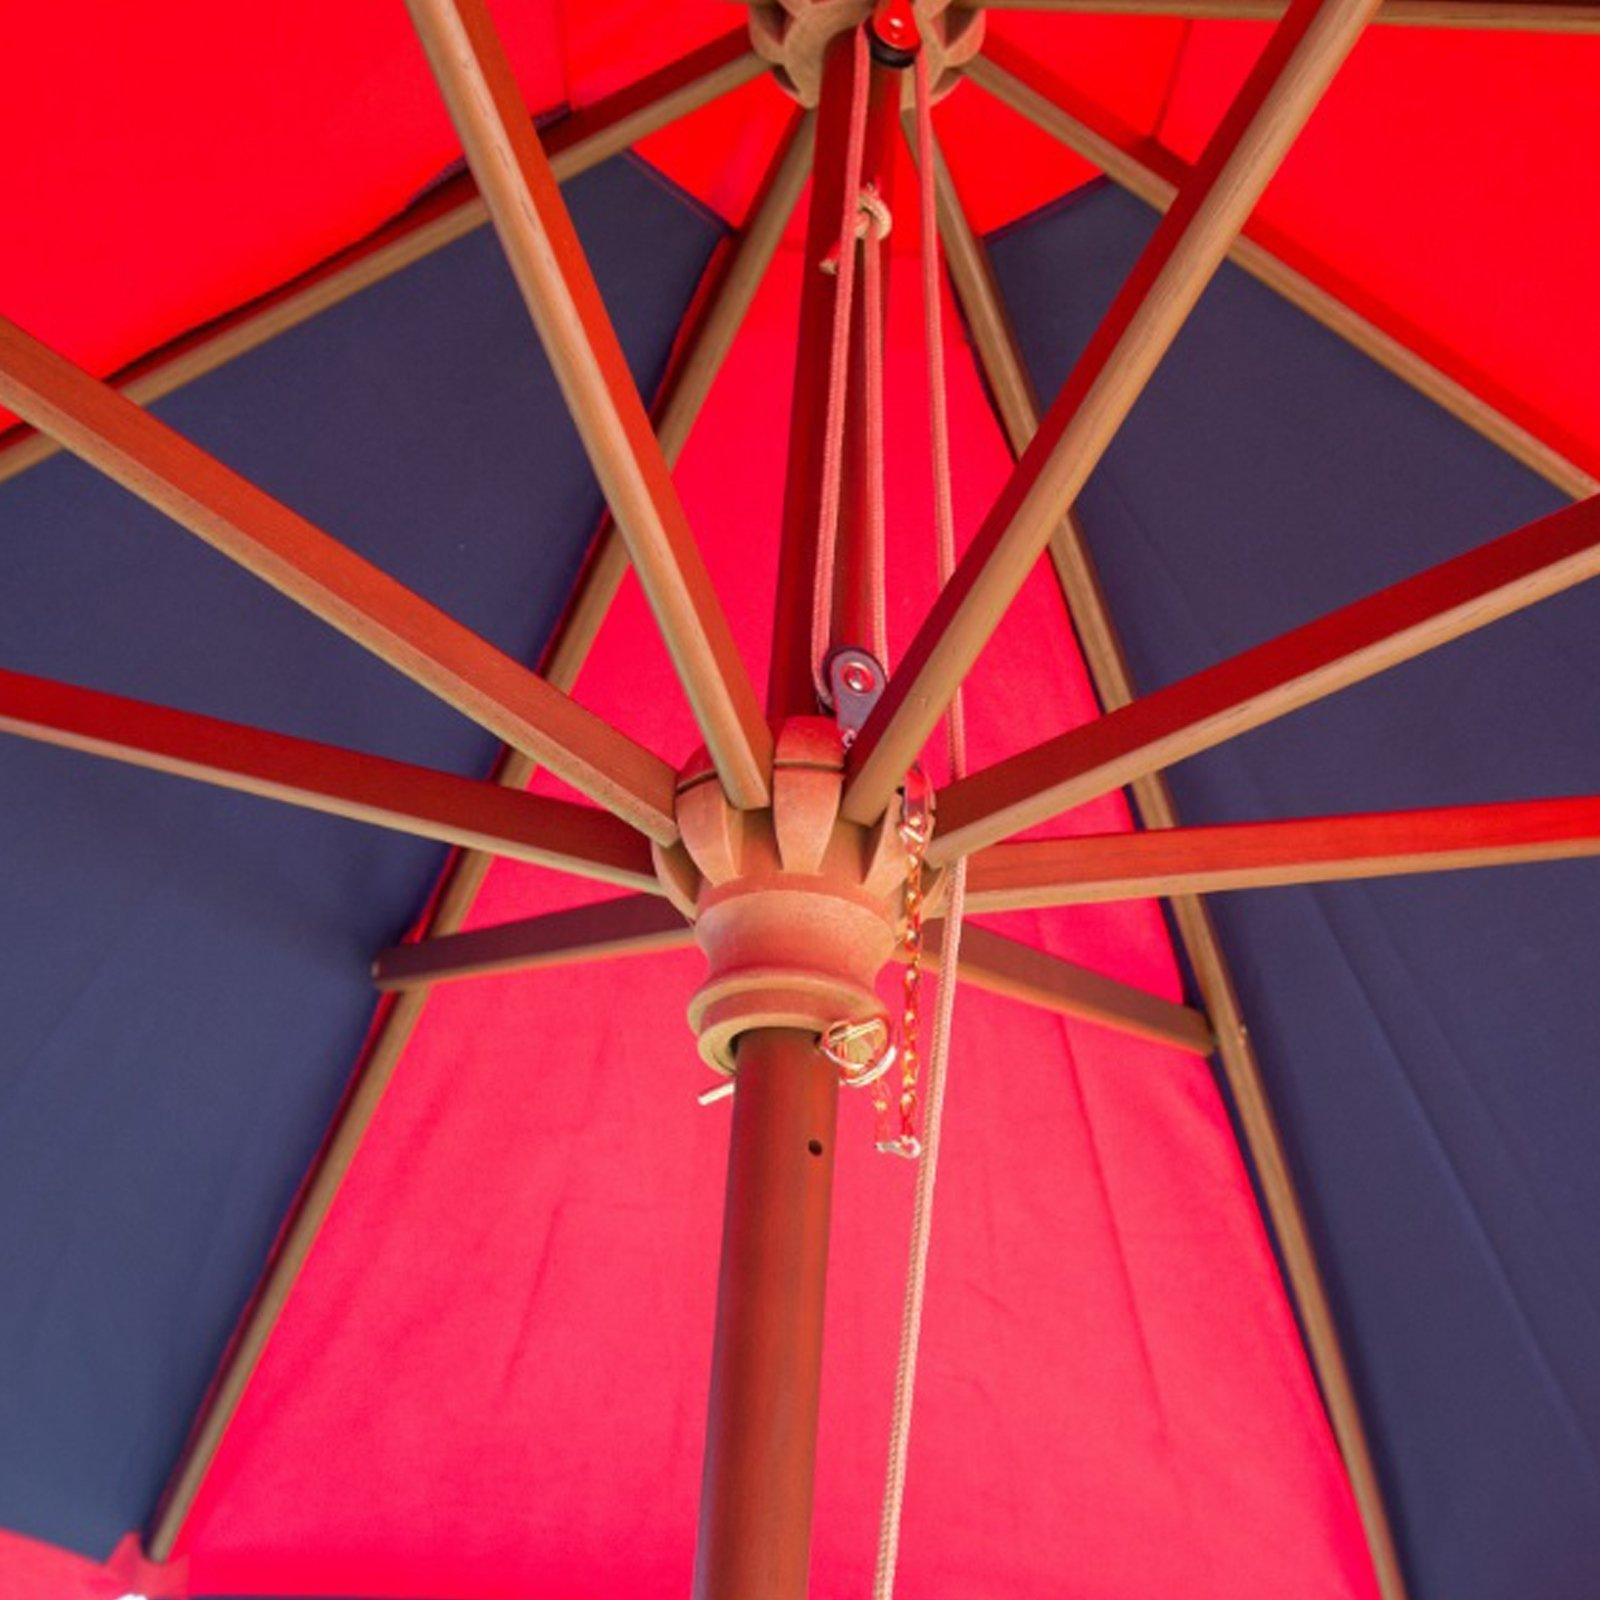 9ft Market Tilt Umbrella Licensed Cinzano Home Patio Outdoor Sun Canopy Shelter